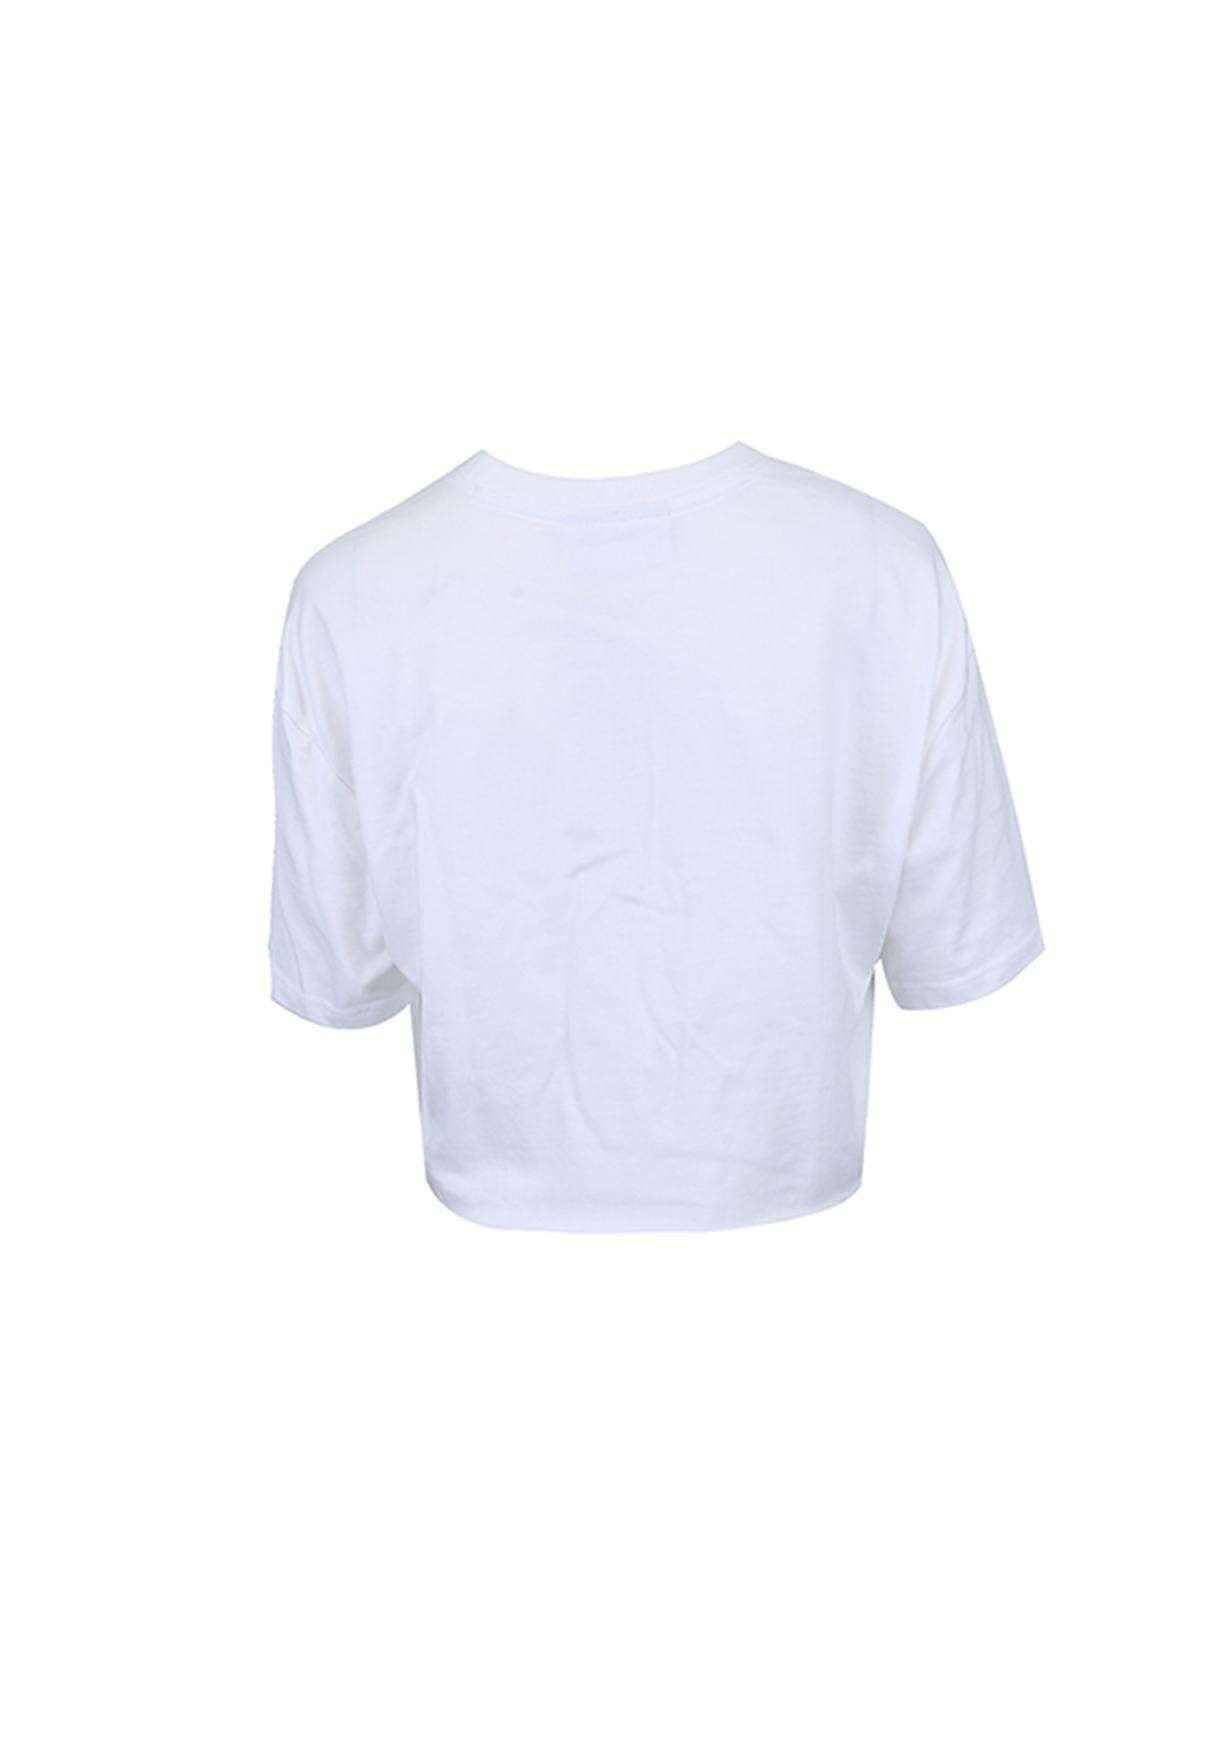 Cut hem tee T-Shirt